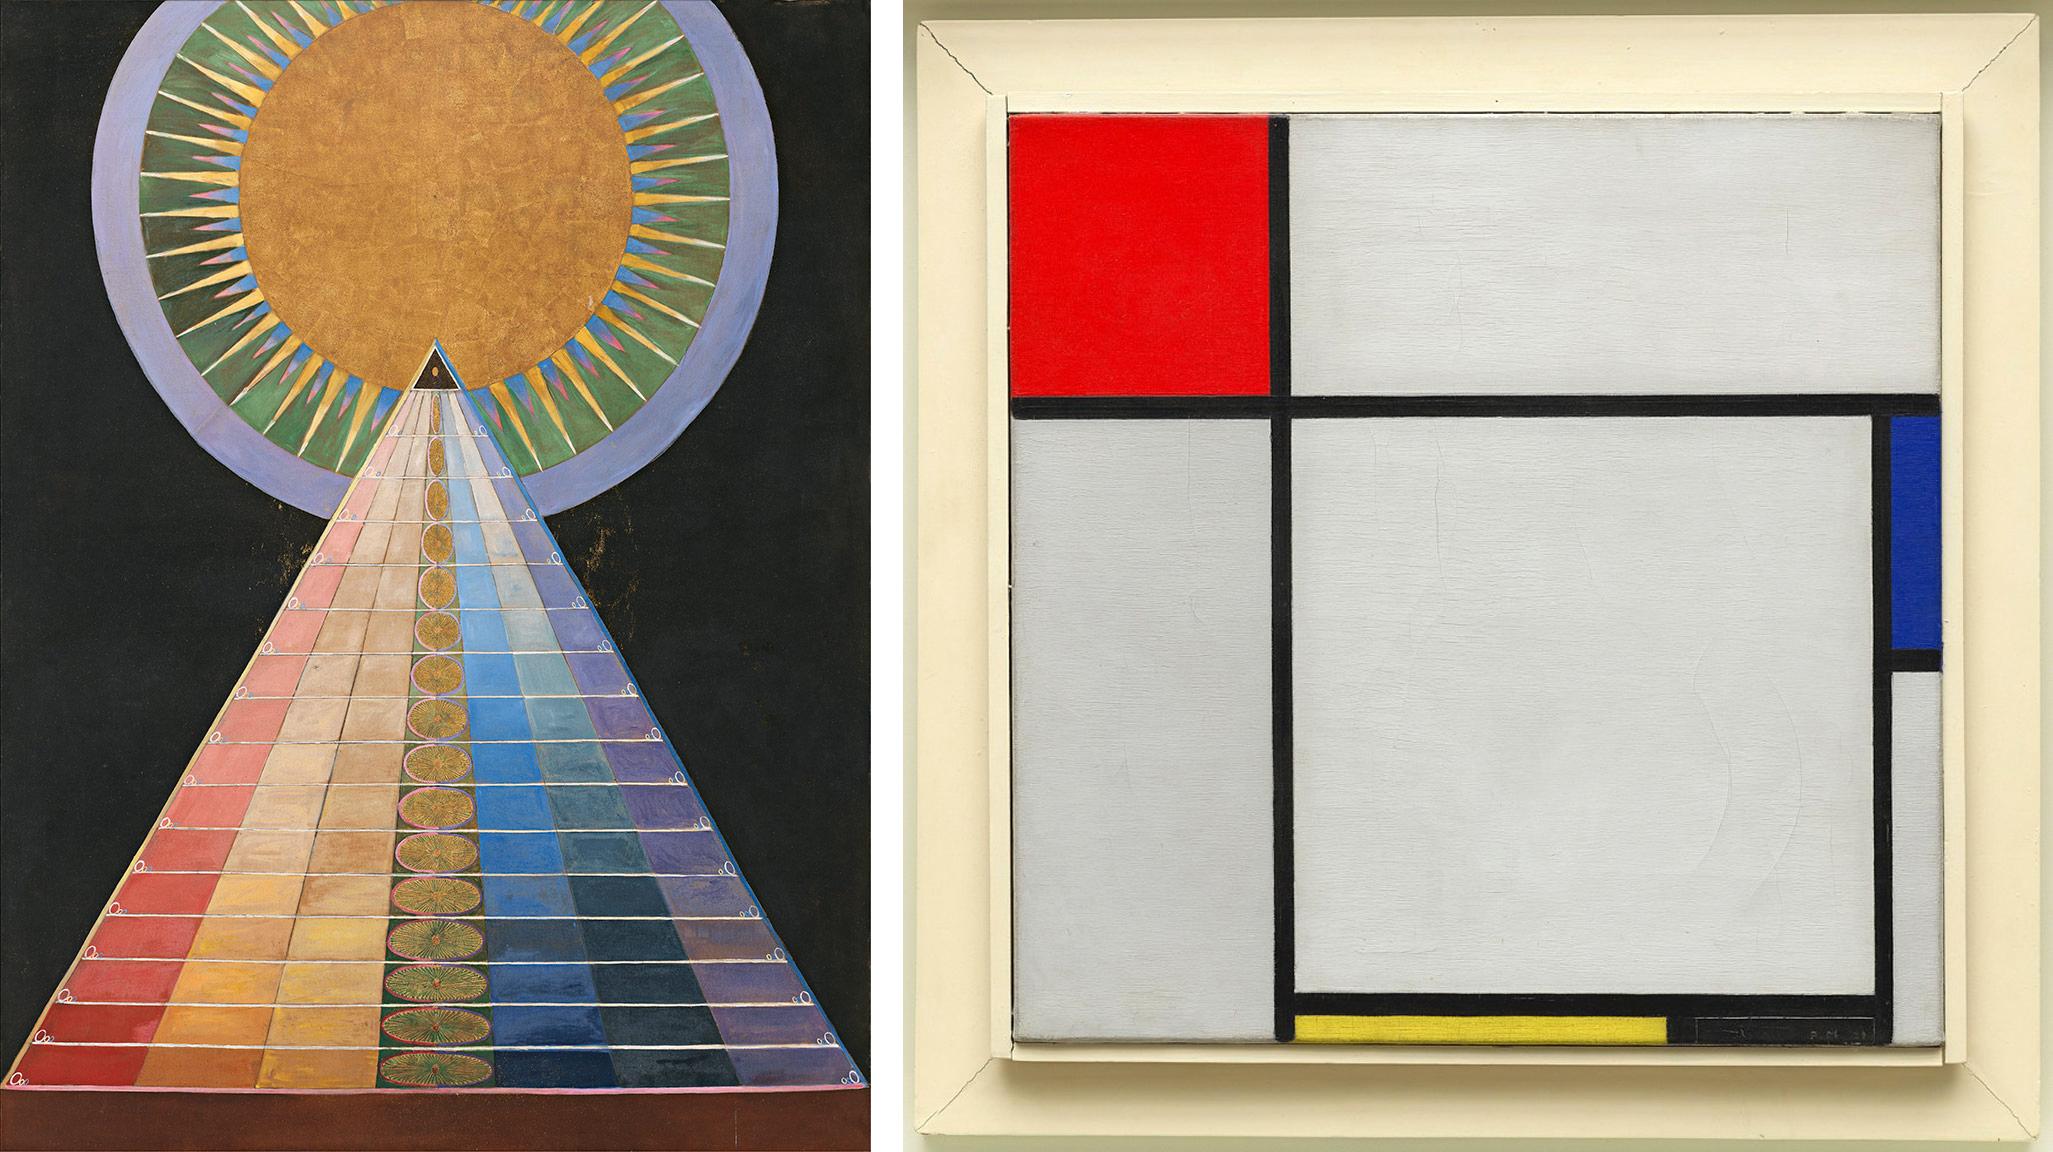 Left: Hilma af Klint, Group X, No. 1, Altarpiece (Altarbild), 1915. Oil and metal leaf on canvas, 93 1/2 x 70 11/16 inches (237.5 x 179.5 cm); Right: Piet Mondrian, Composition, 1929, oil on canvas, 45.1 x 45.3 cm (Guggenheim Museum)